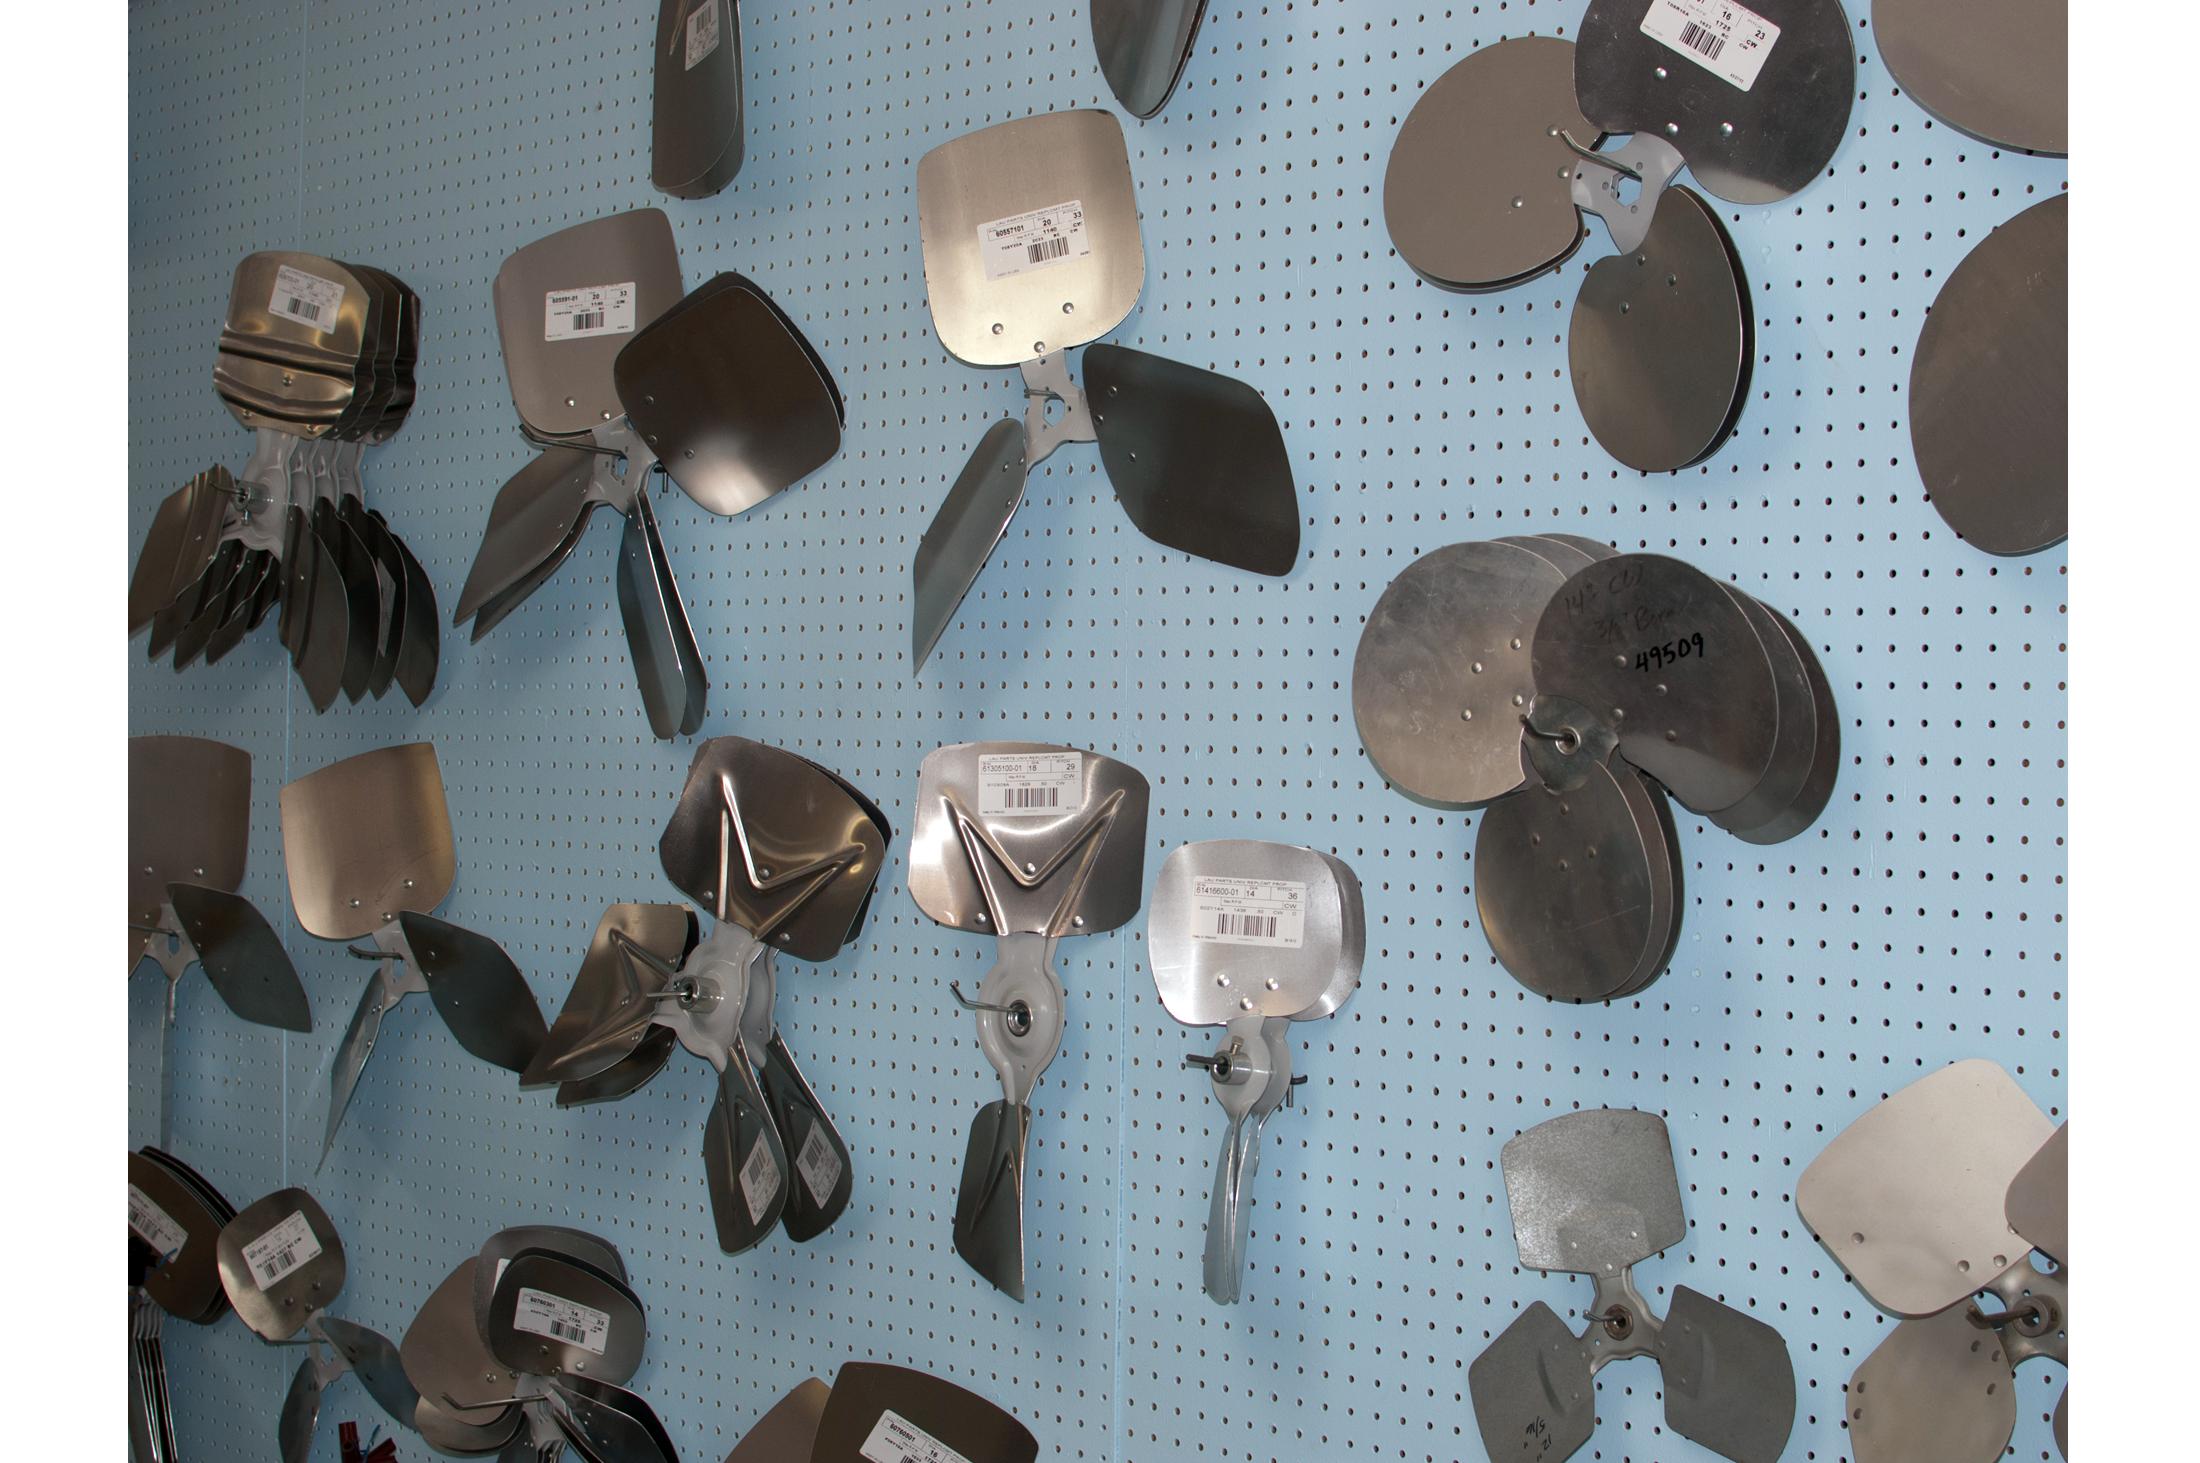 Large Fan Blades : Dock de icer saver thermostat motors pumps sump